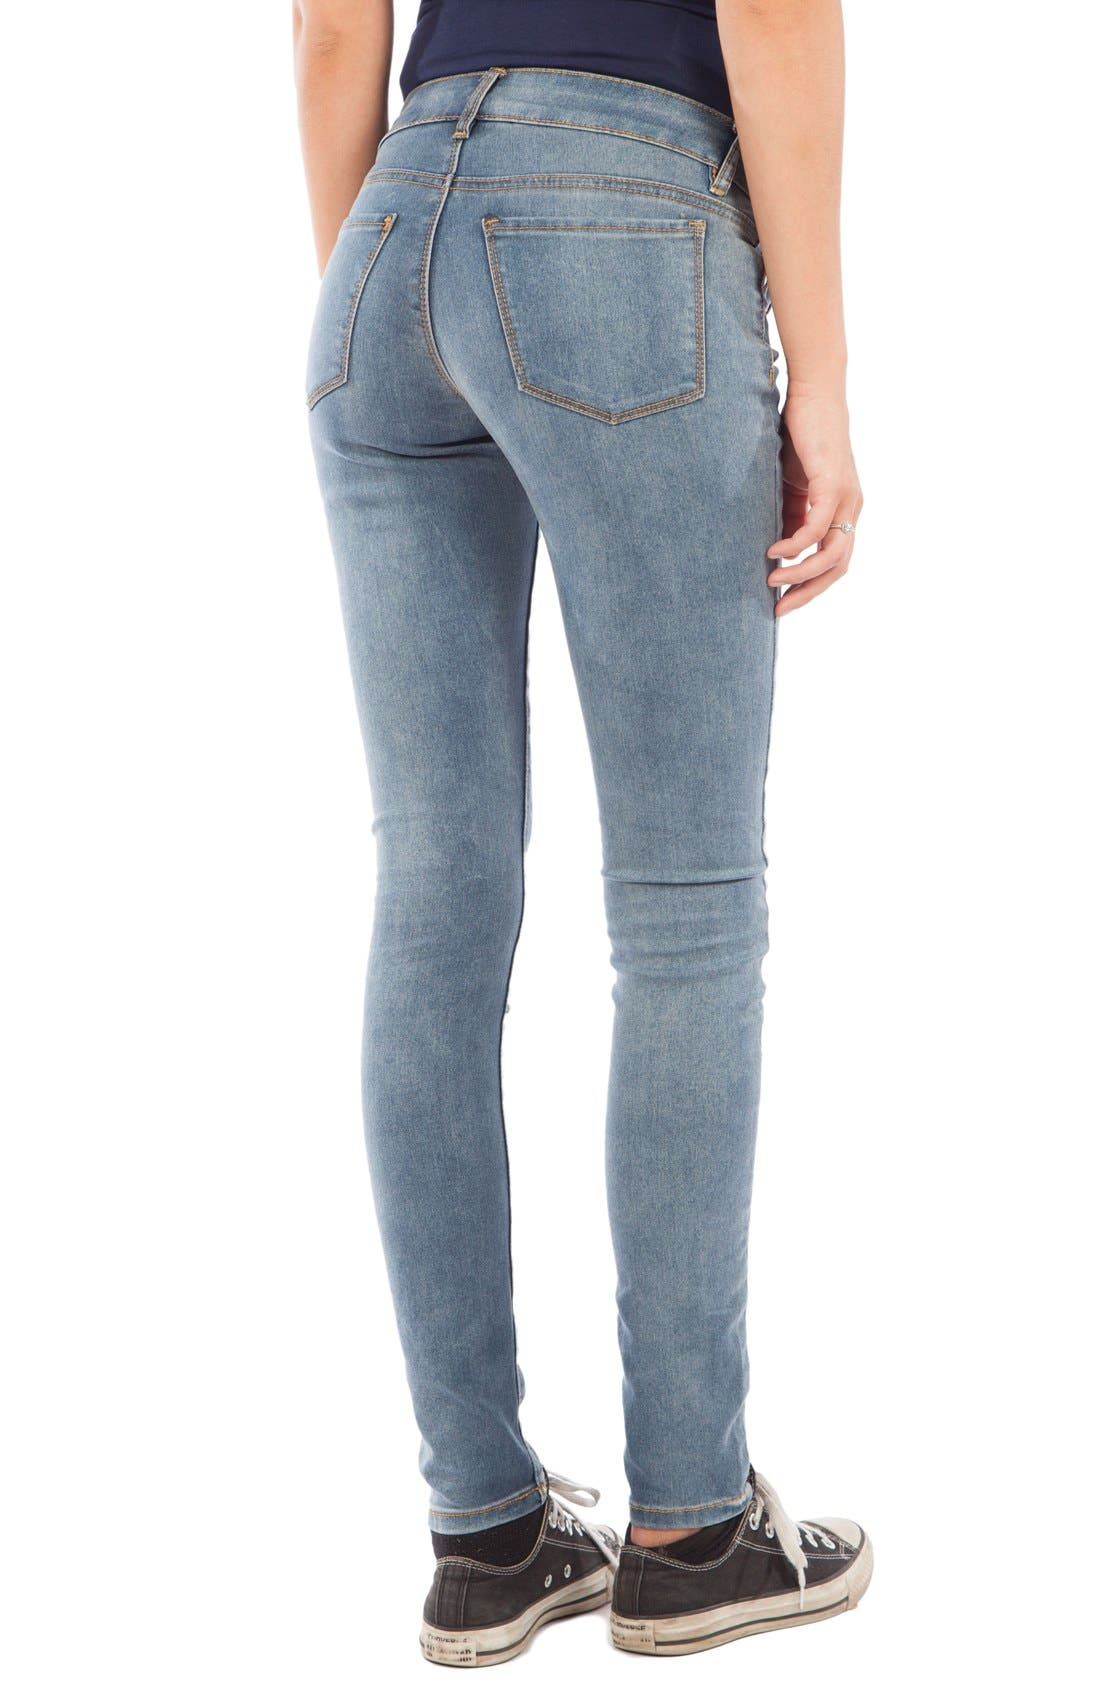 Skinny Maternity Jeans,                             Alternate thumbnail 2, color,                             MEDIUM BLUE WASH